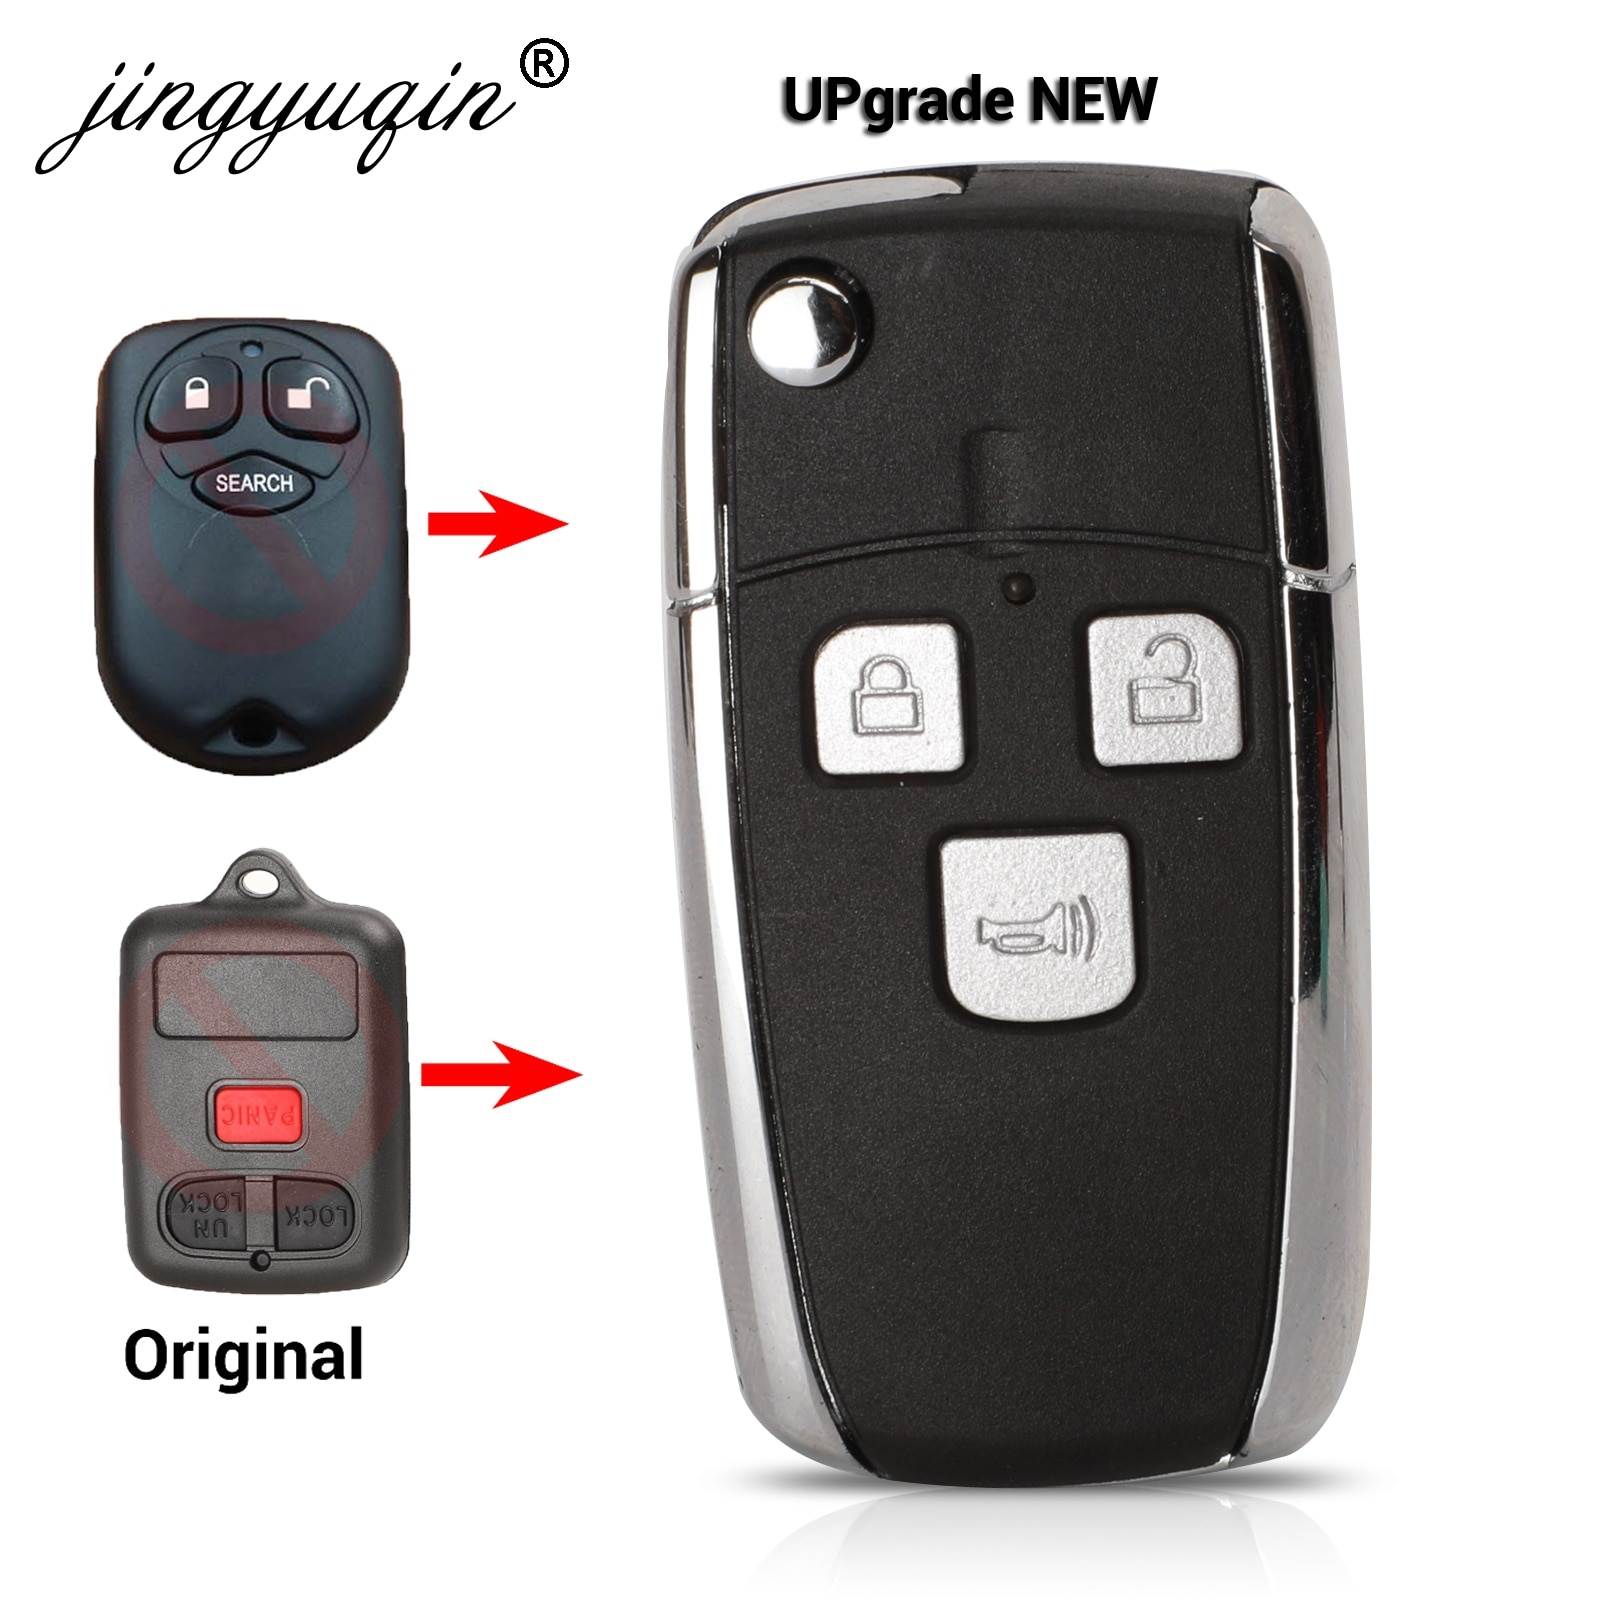 Jingyuqin modificado remoto Flip Key Shell para BYD F3 F3R Fit Toyota Vios 3 botones Fob sin llave transmisor de entrada de la caja de la llave del coche